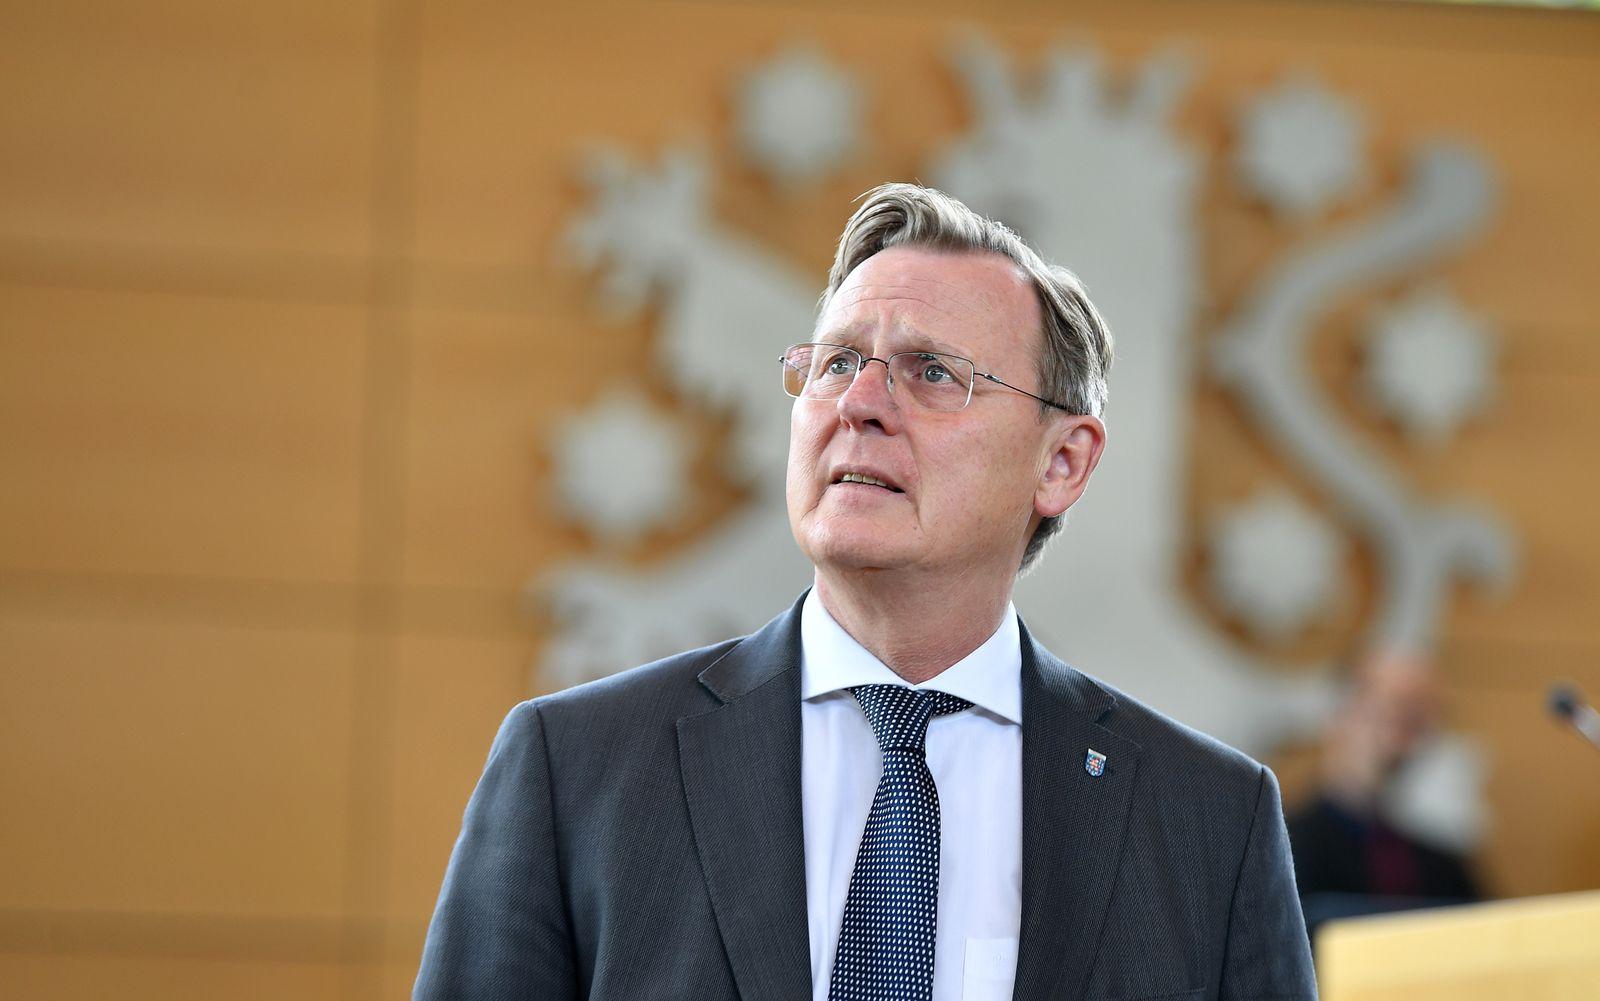 Landtagssitzung Thüringen/ Bodo Ramelow